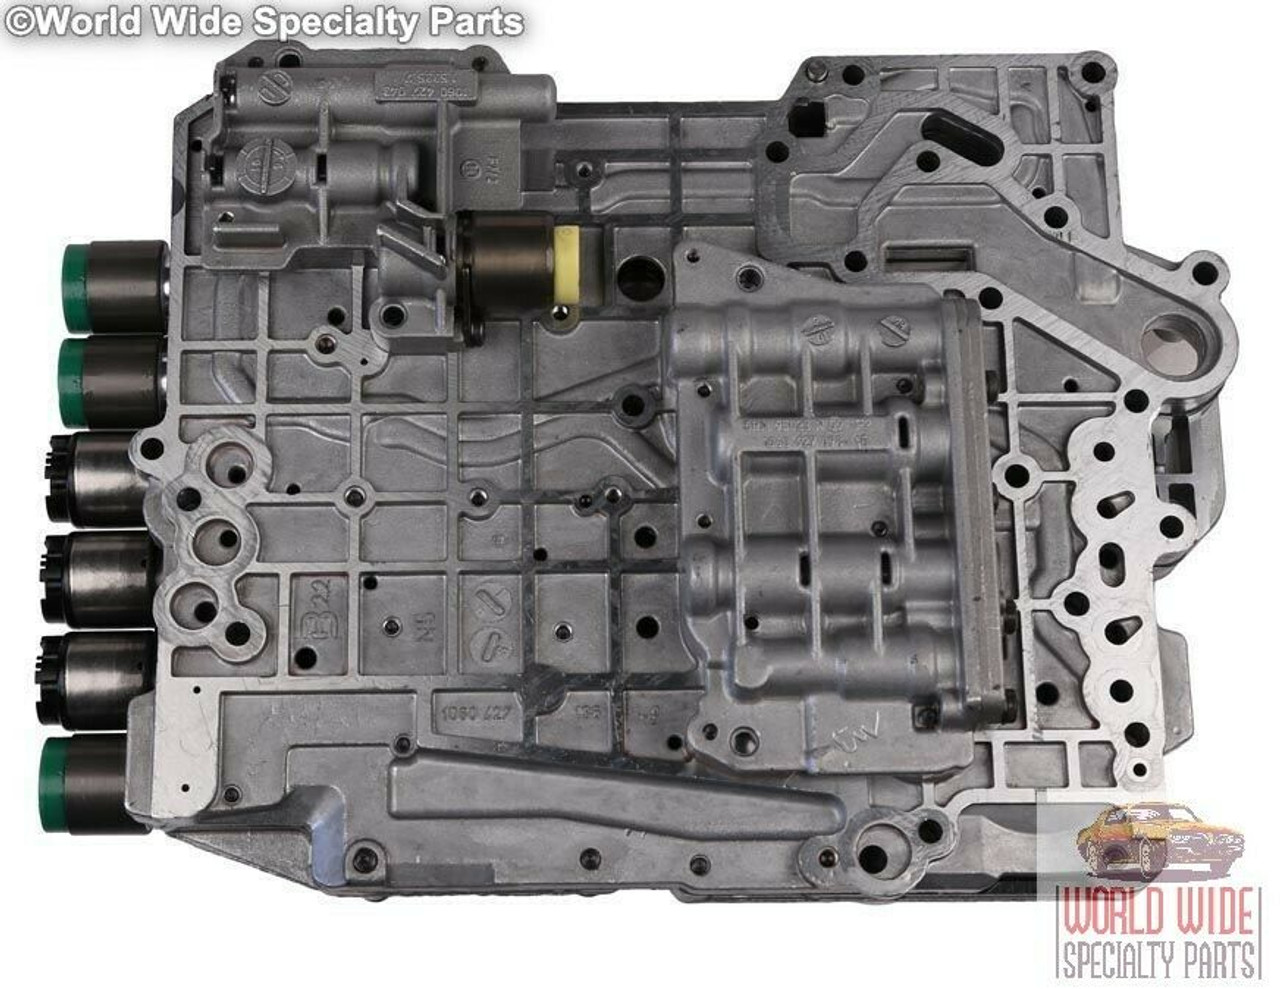 ZF 5HP19, 01V Valve Body Rebuild and Return Service - No Bolt on Speed Sensors